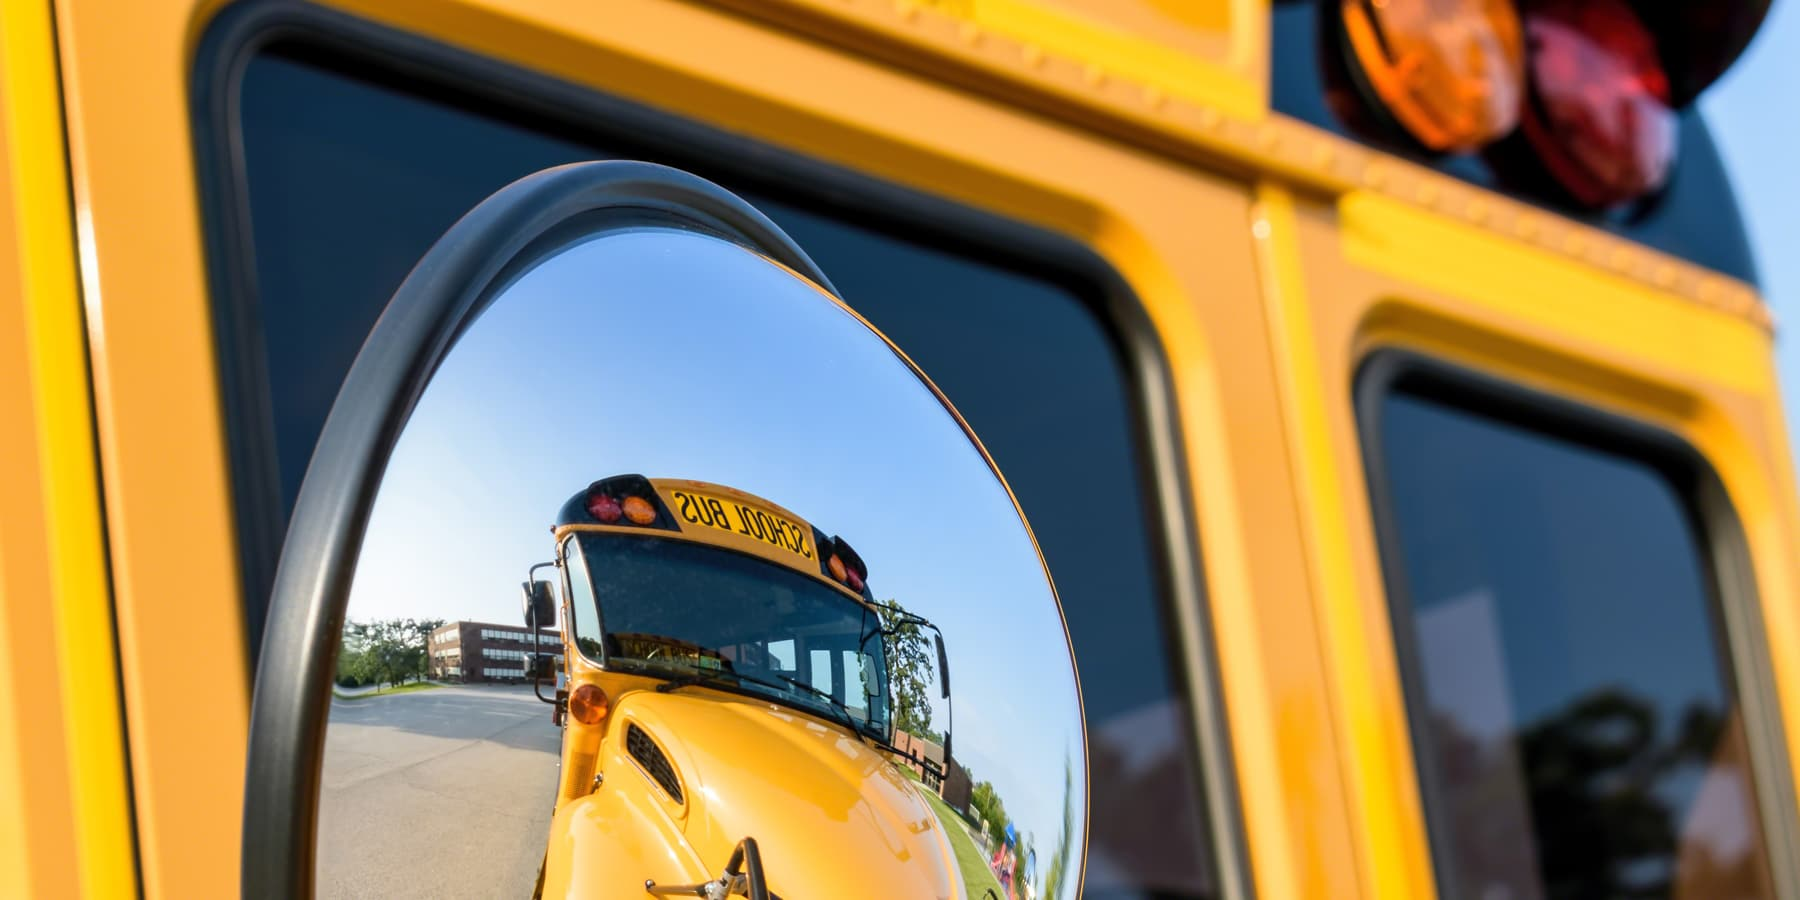 PFLUGERVILLE SCHOOL BUS ACCIDENT